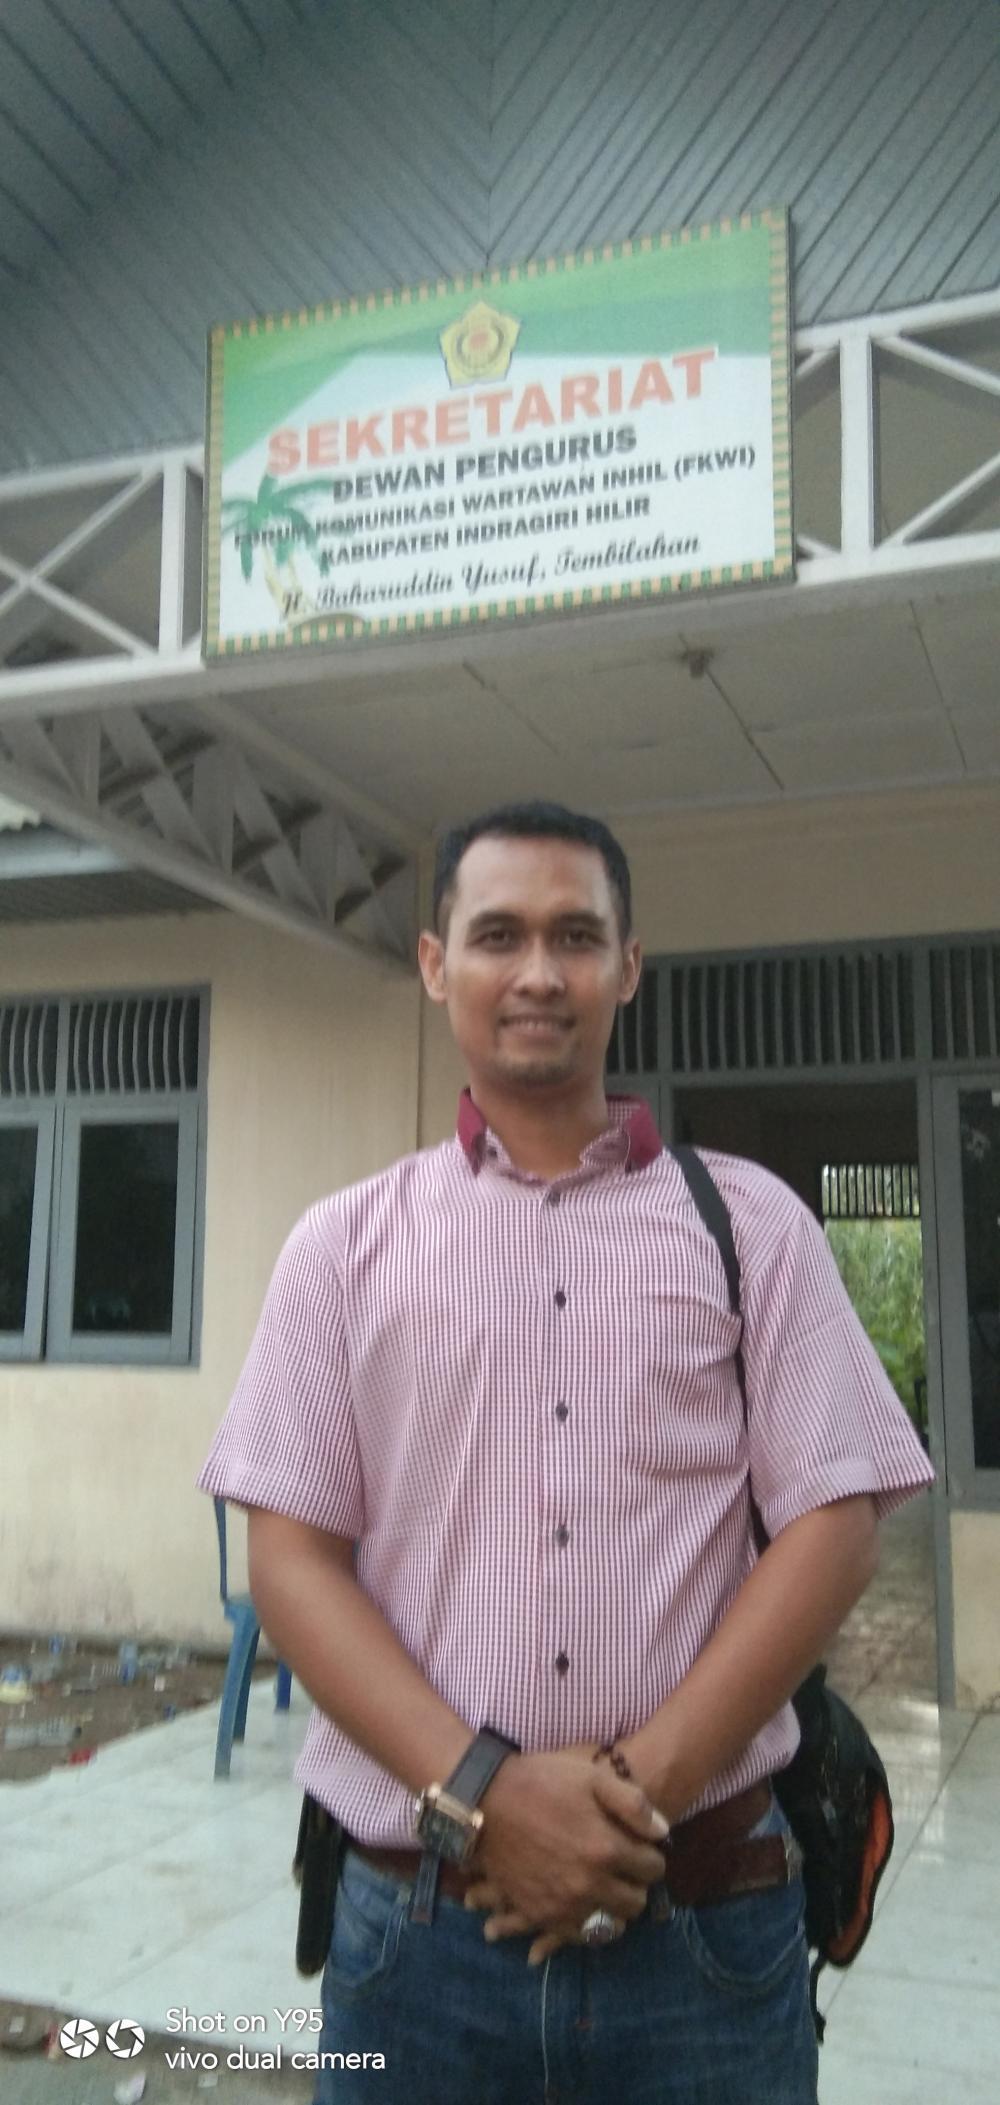 Debi Chandra syah Riwan Nakhodai Forum Komunikasi Wartawan Inhil(FKWI) periode 2019-2021